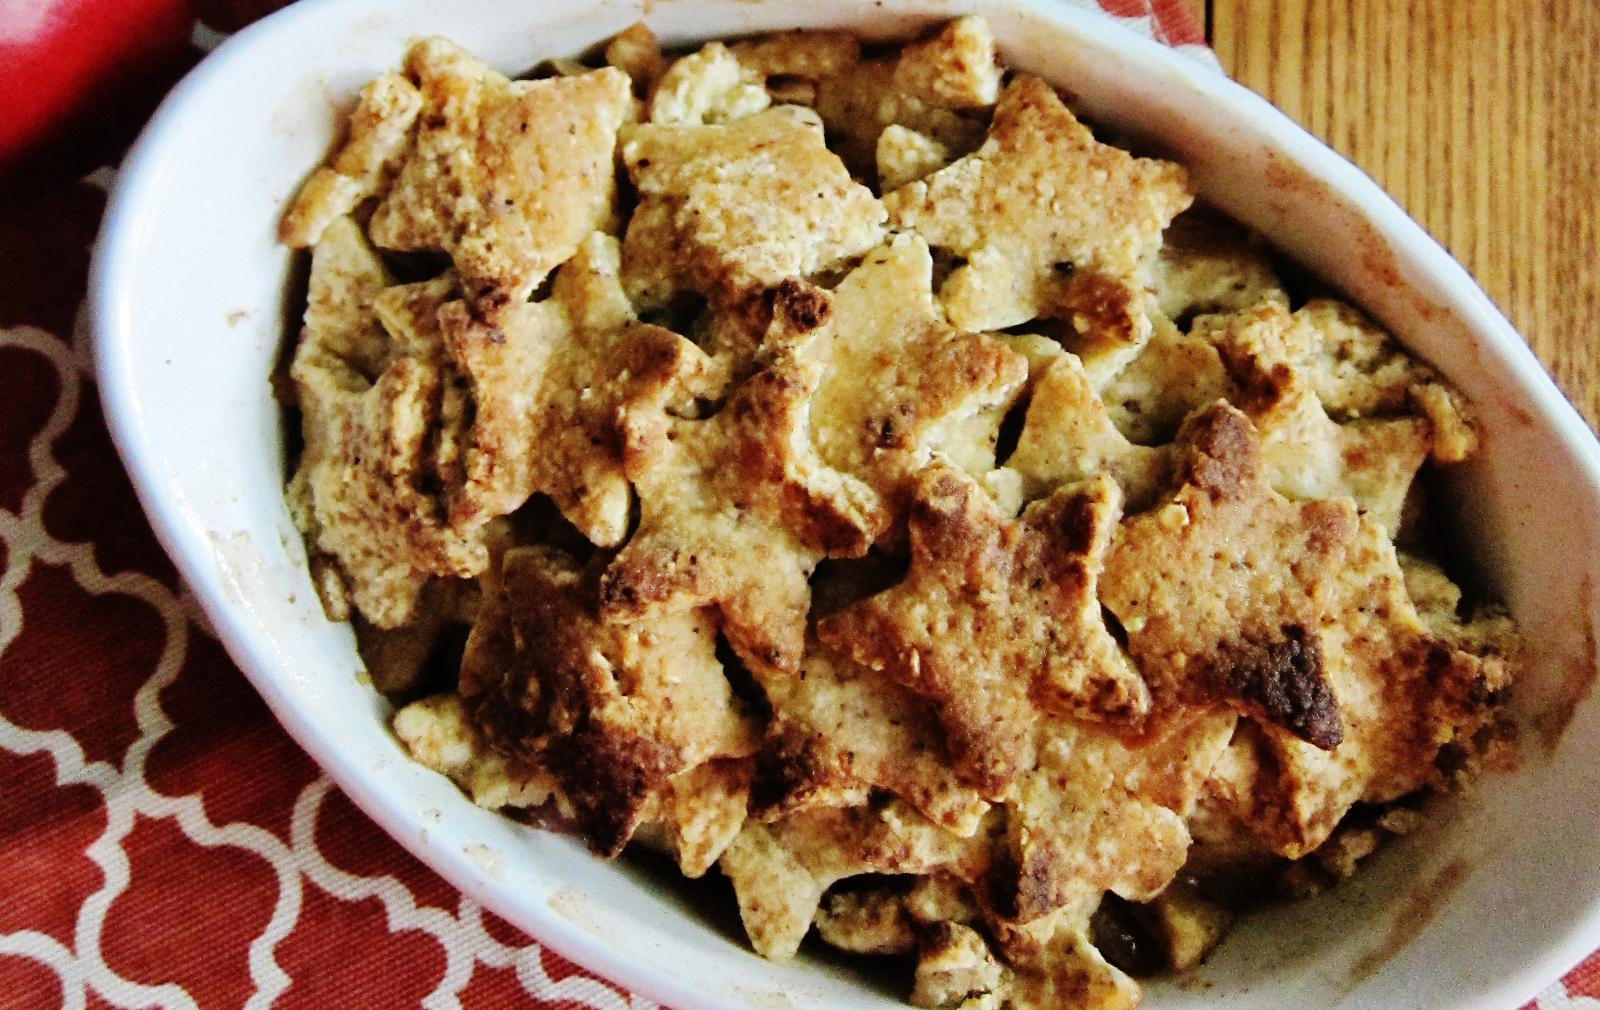 Cinnamon Apple Pear Pandowdy [Vegan, Gluten-Free]